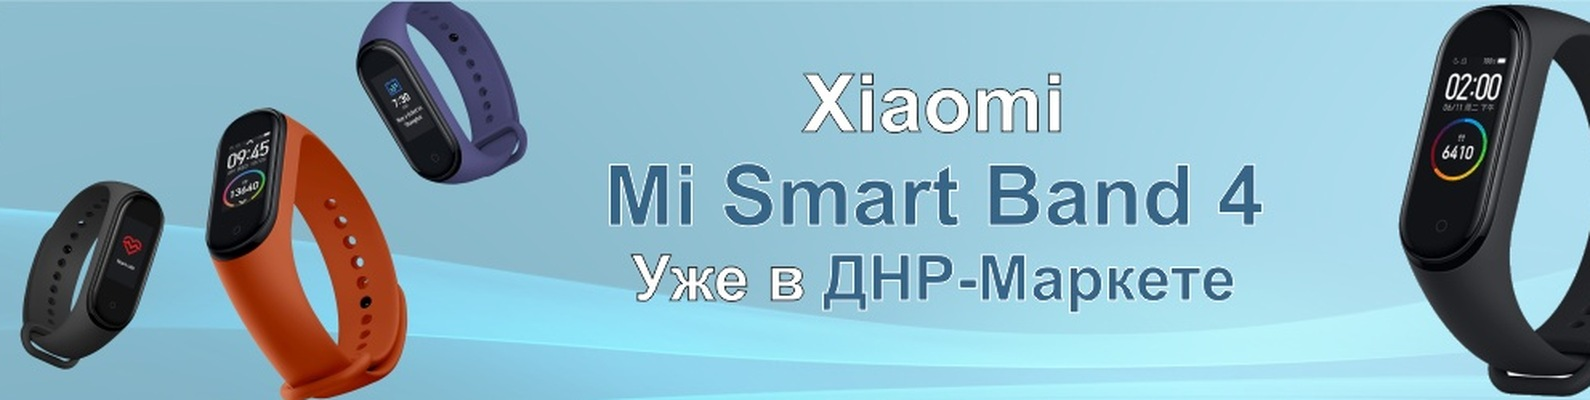 bc7272cacdf79 Интернет-магазин ДНР-Маркет #DNR_MARKET   ВКонтакте